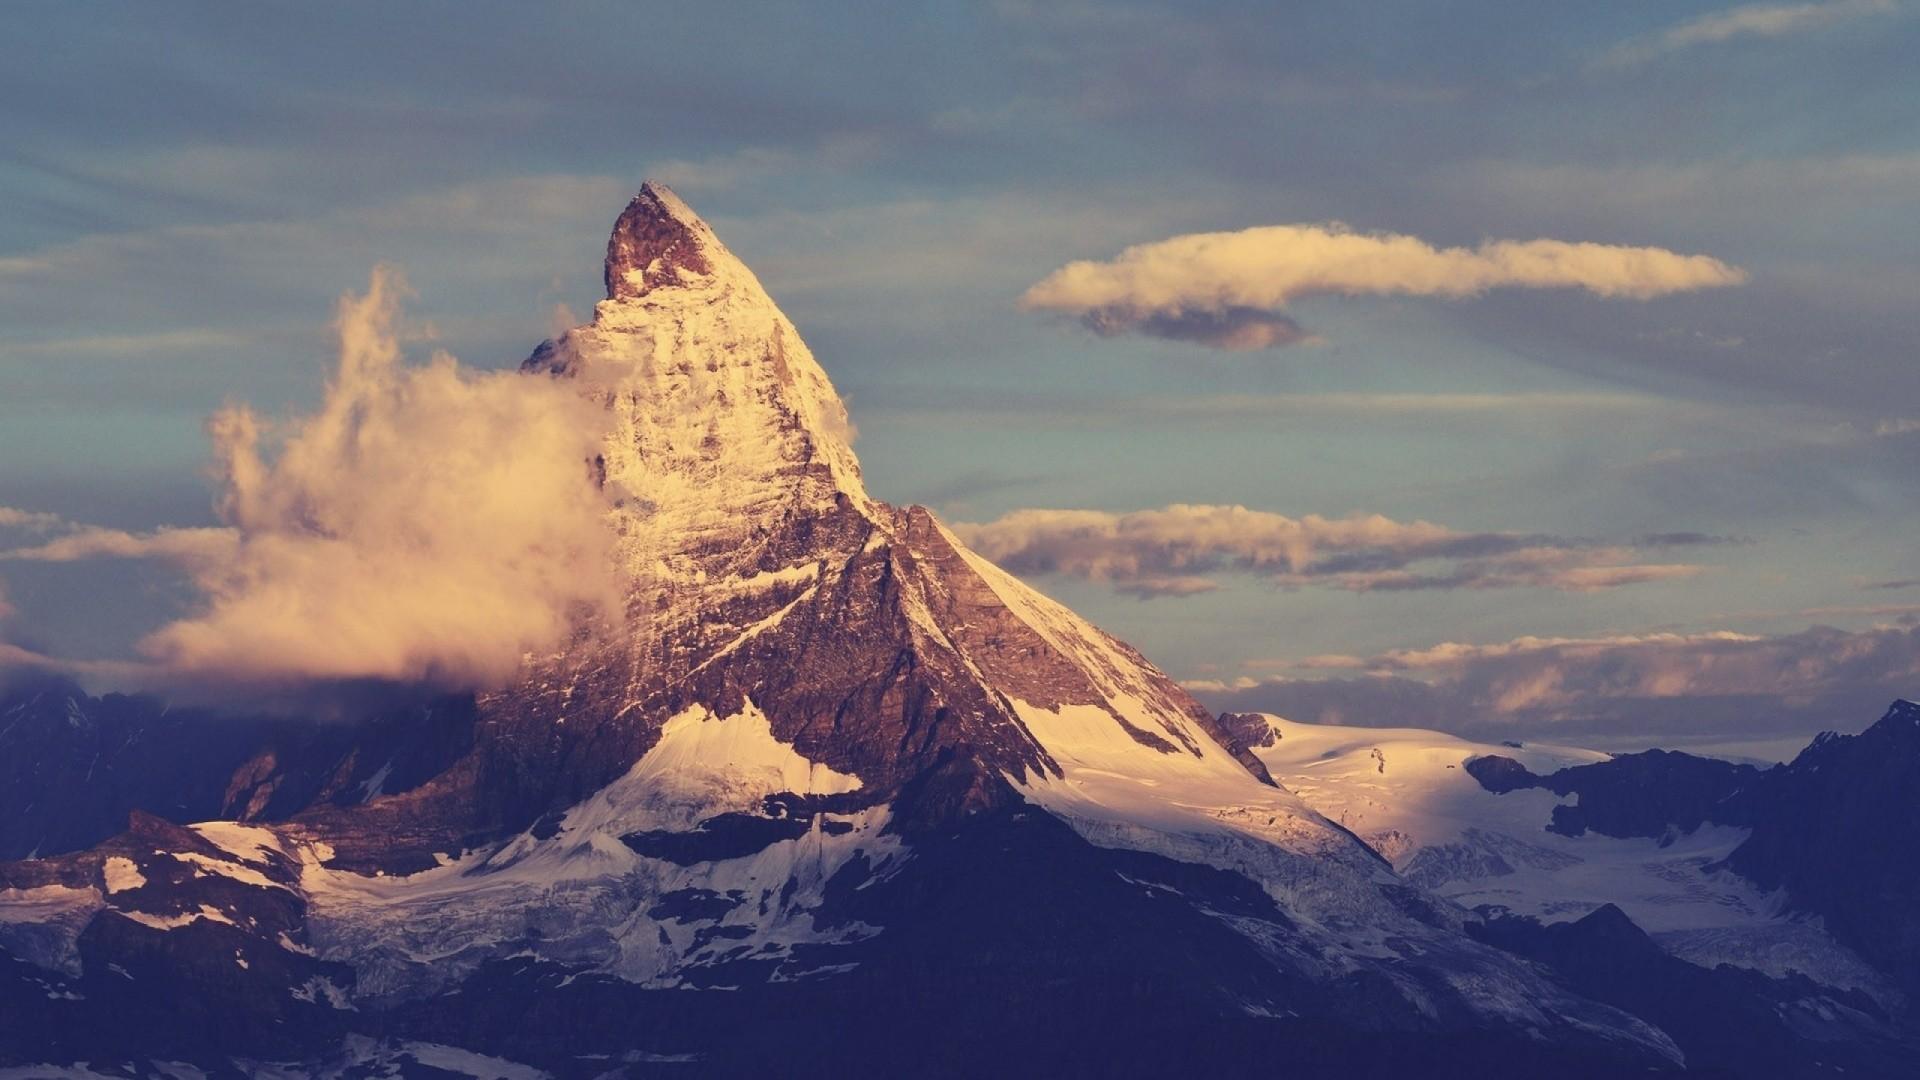 Matterhorn Mountain Peak. How to set wallpaper on your desktop?  Click the download link from above and set the wallpaper on the desktop  from your …